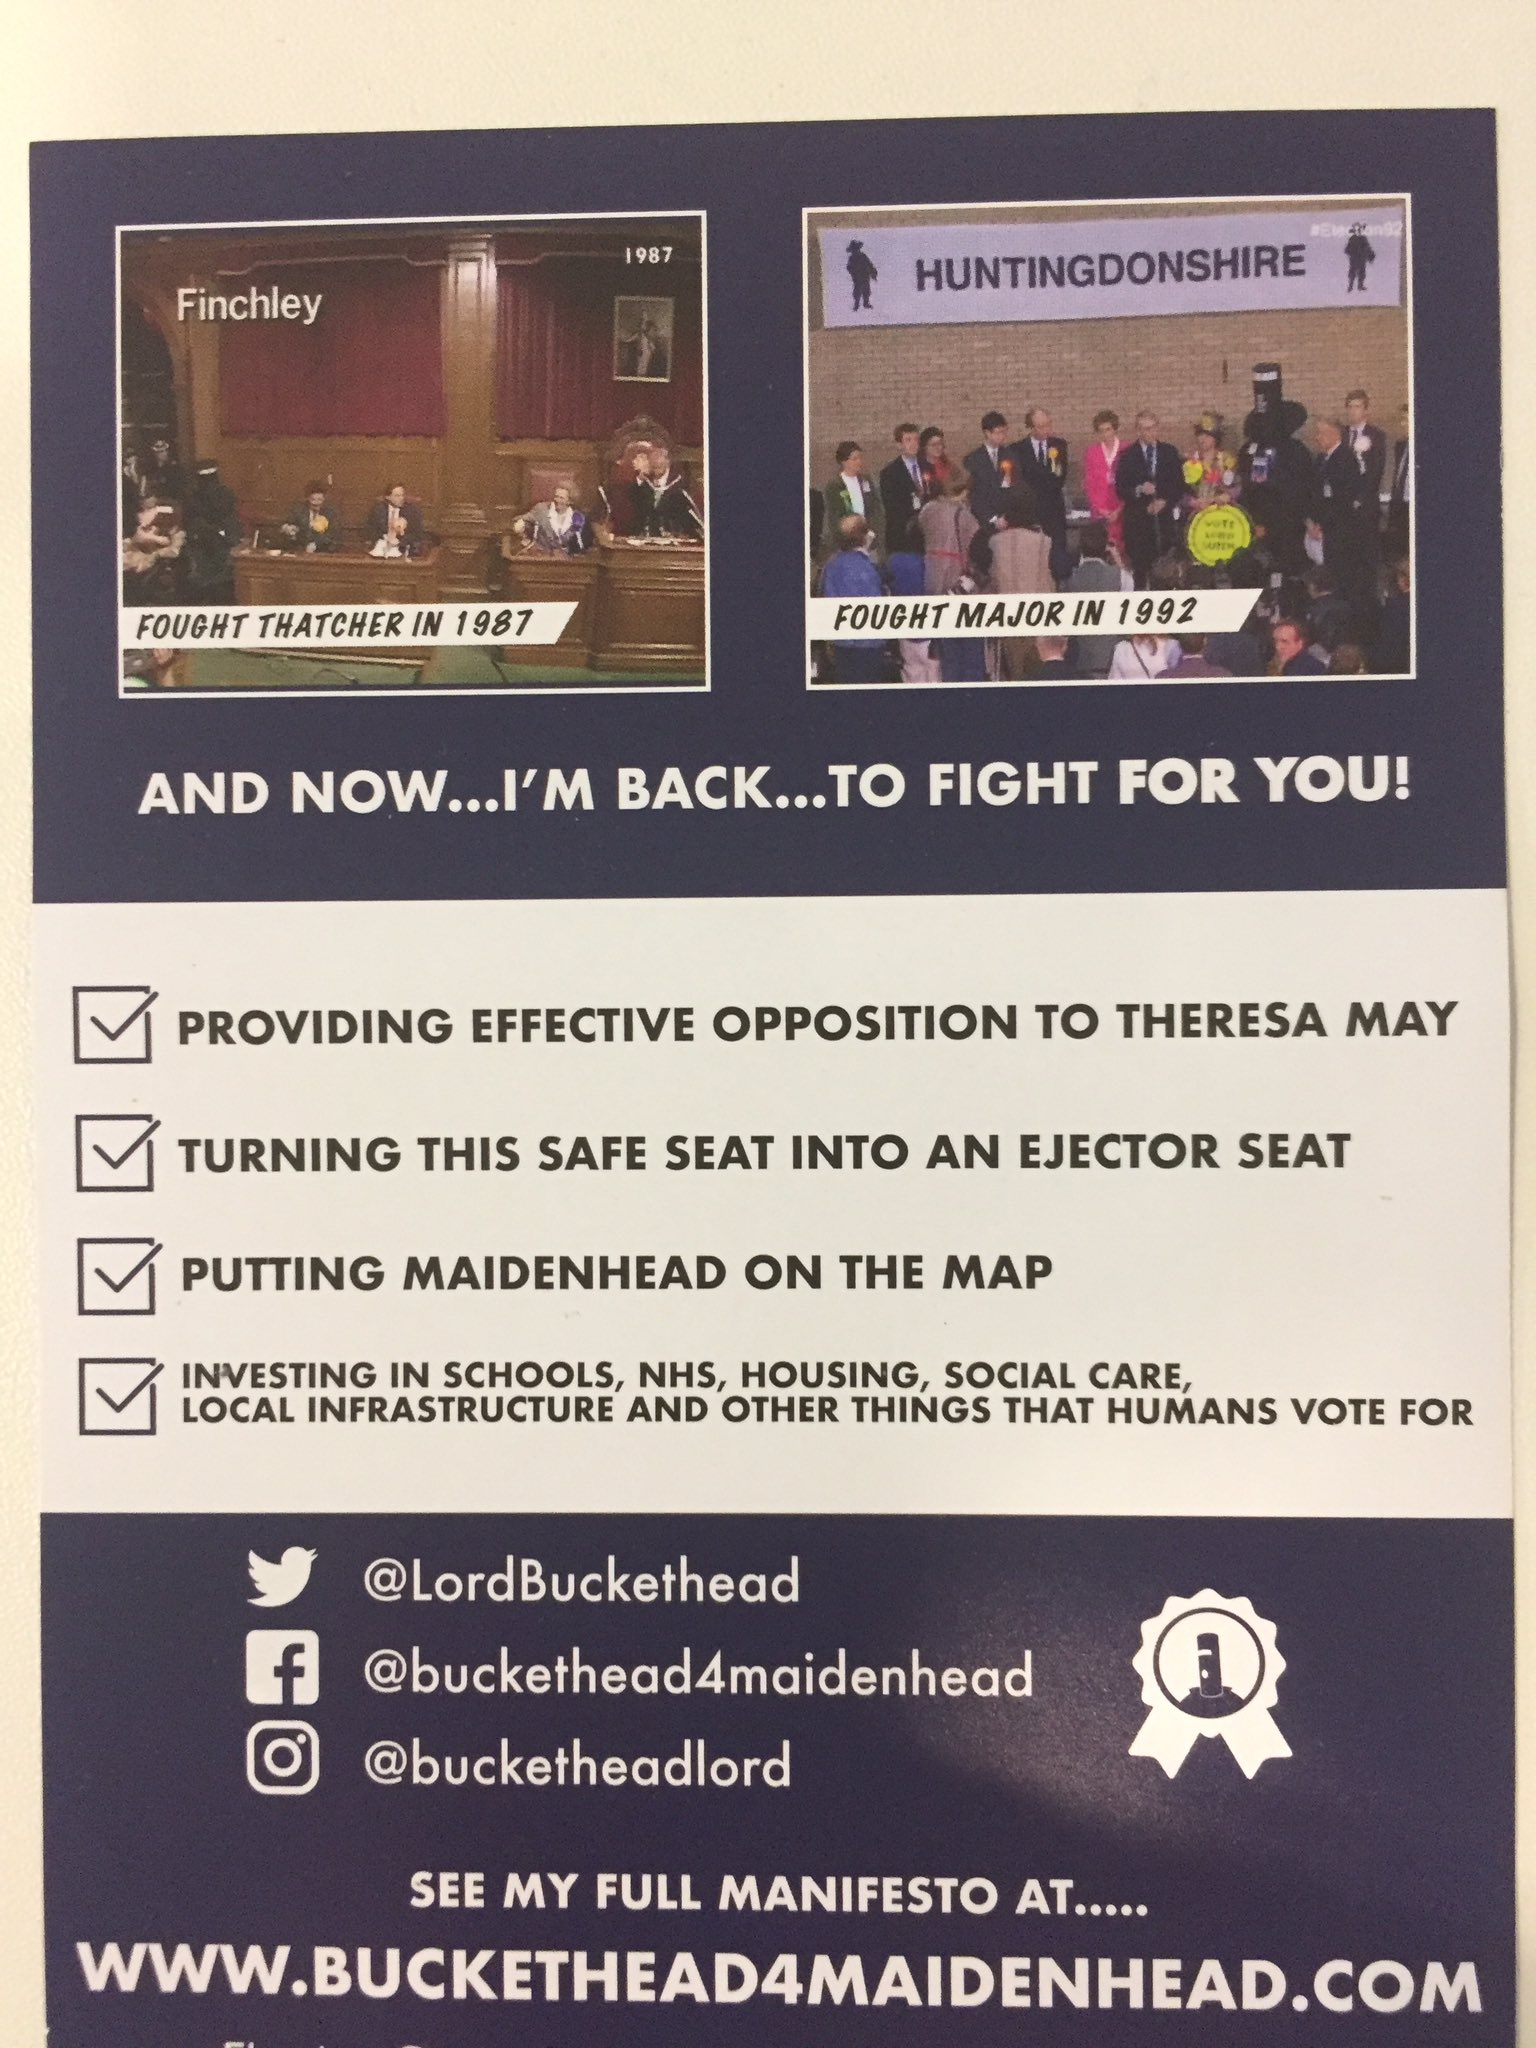 Lord Buckethead Manifesto